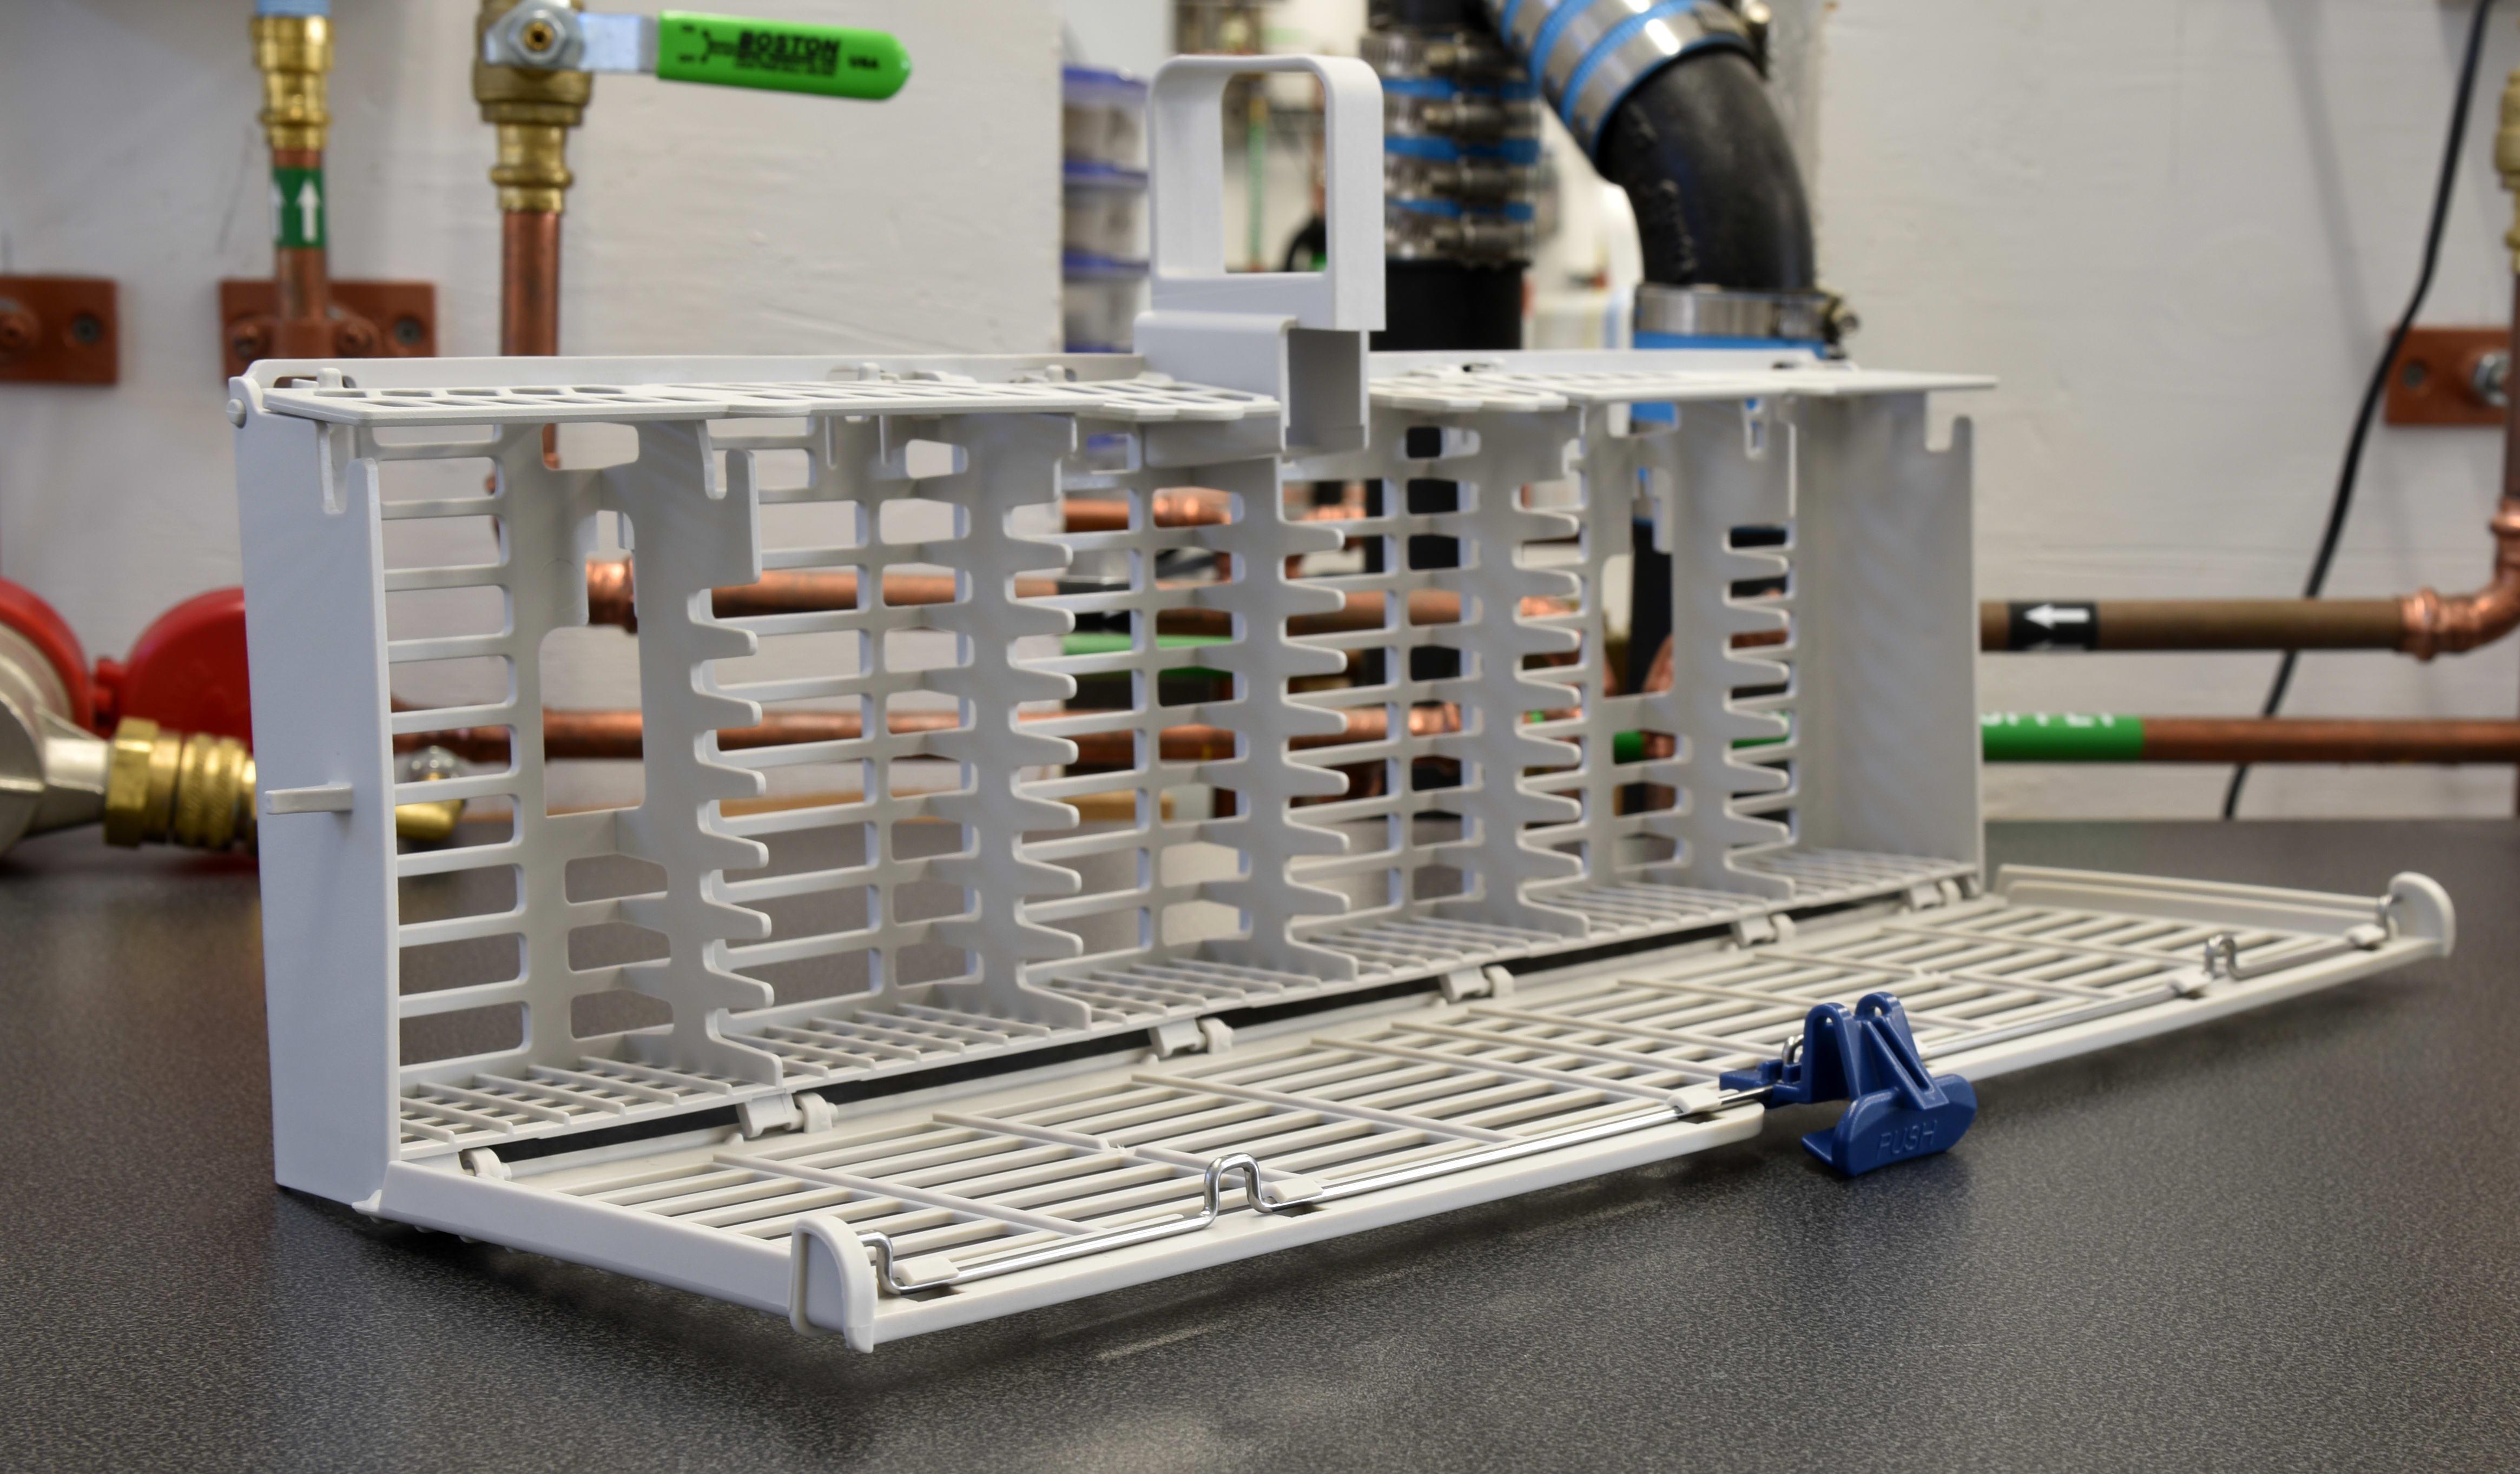 Whirlpool WDF540PADM opened cutlery basket